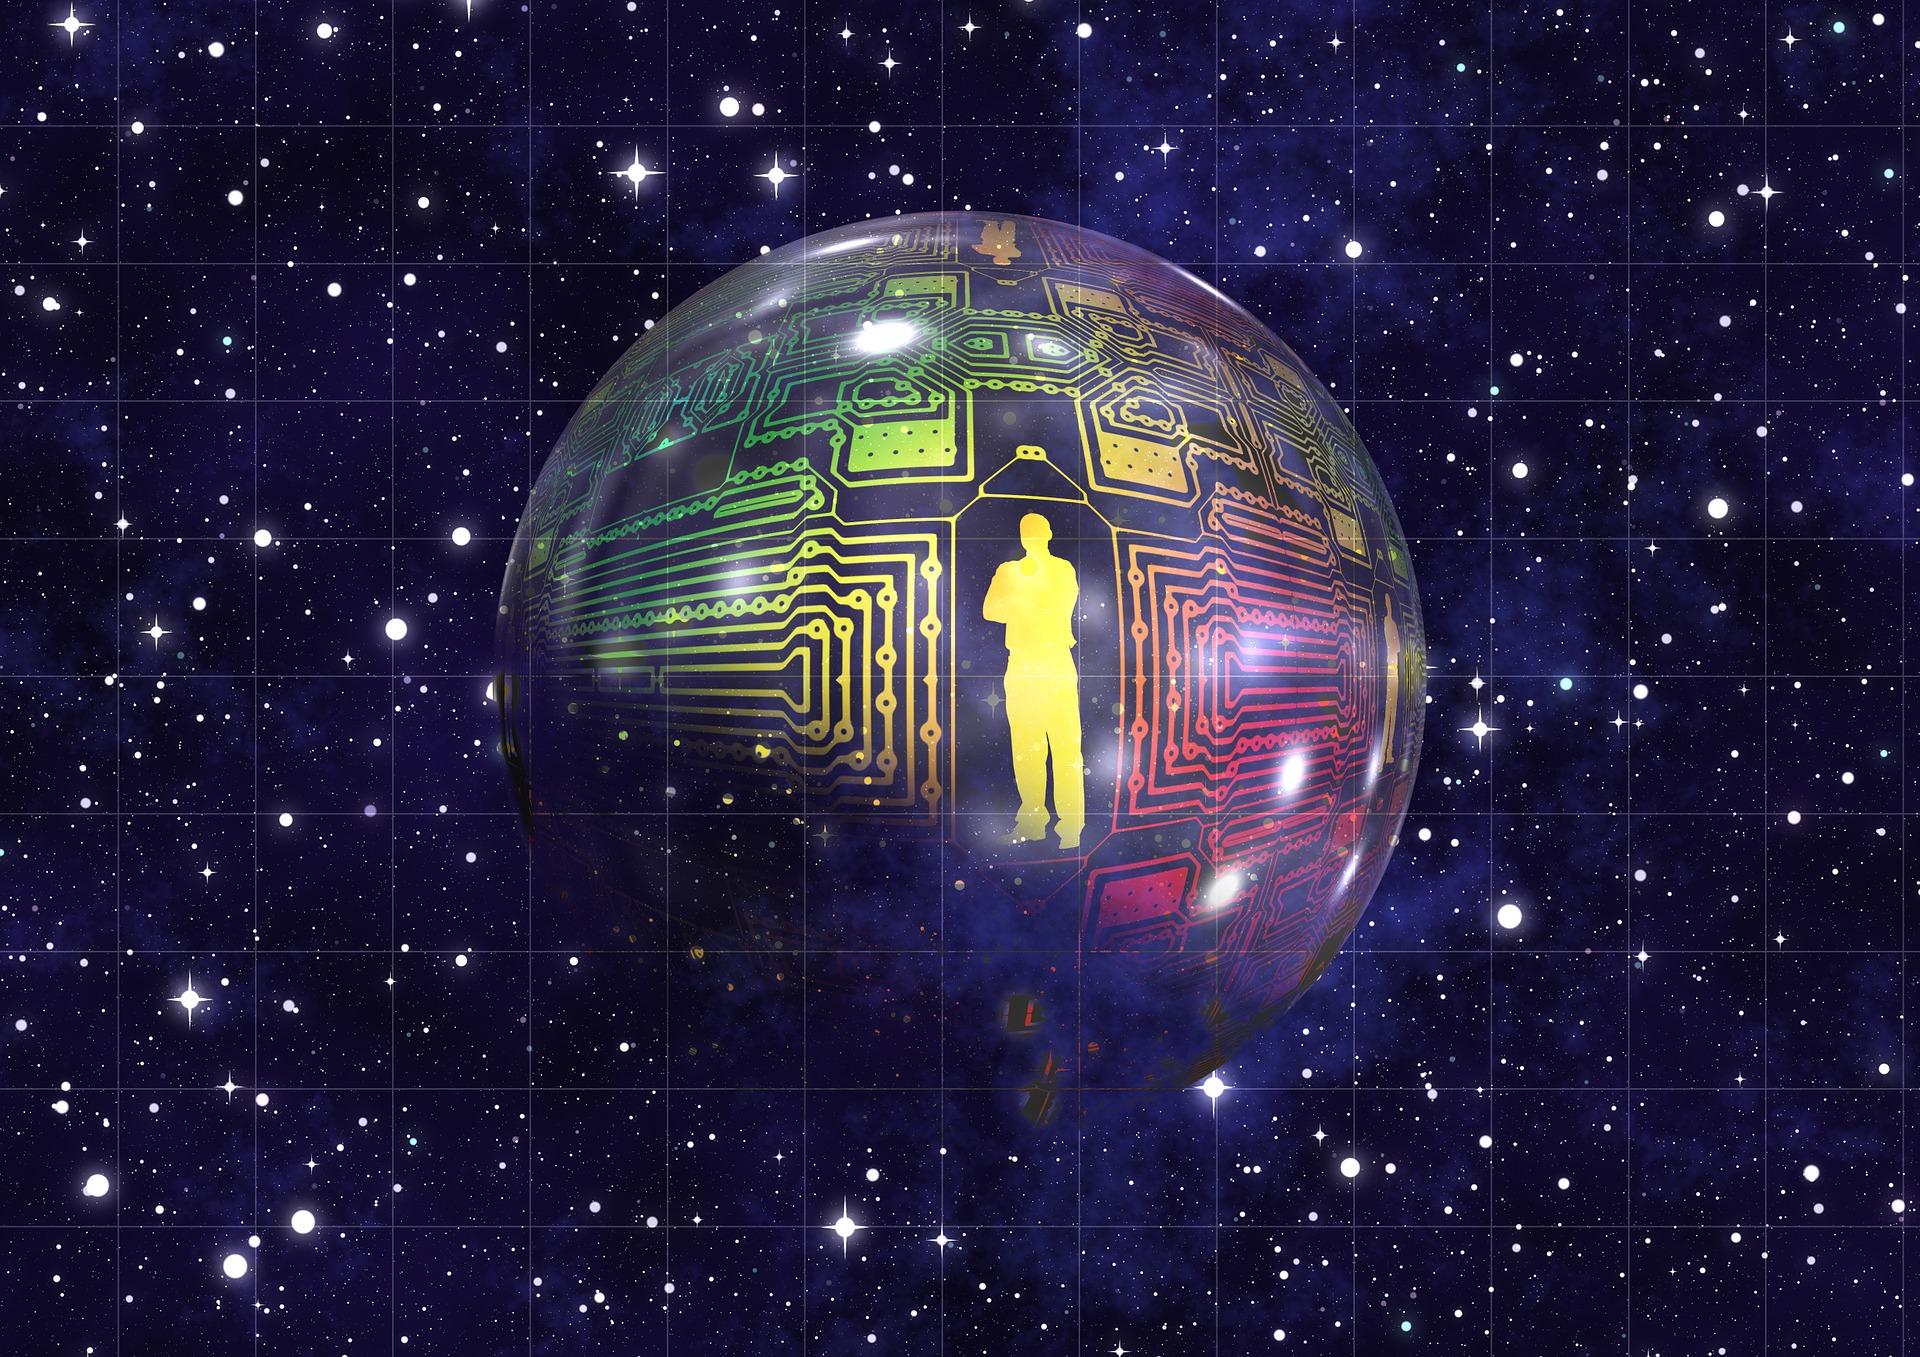 universe-1282374_1920.jpg